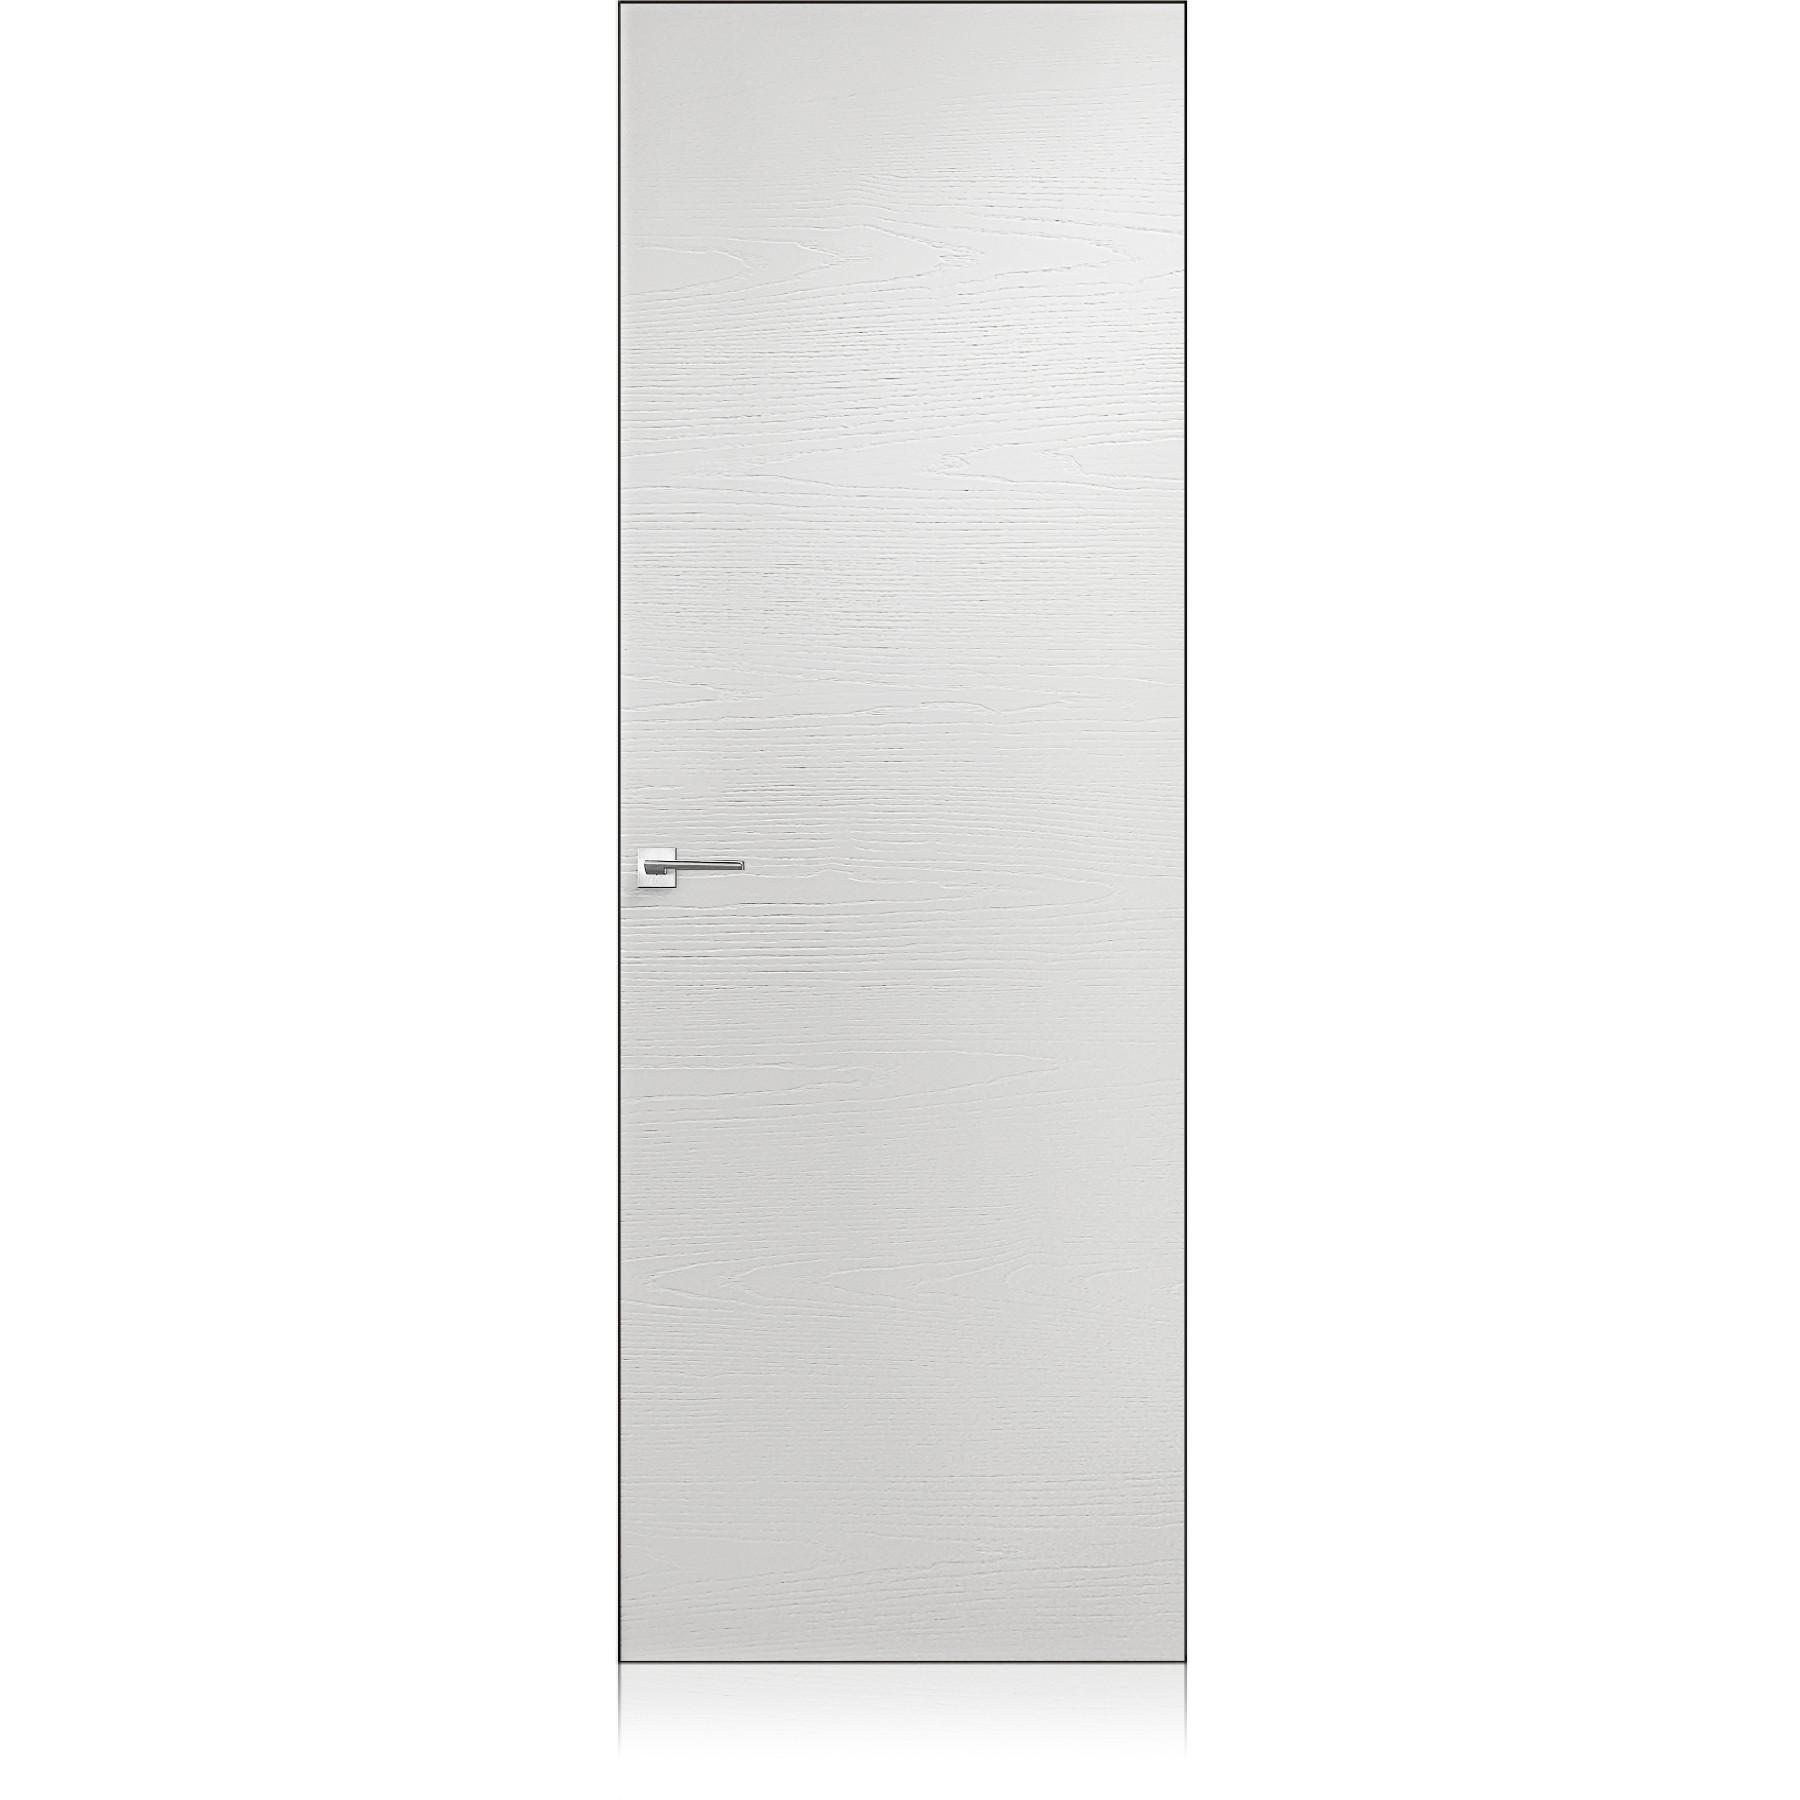 Equa Zero trame bianco optical door